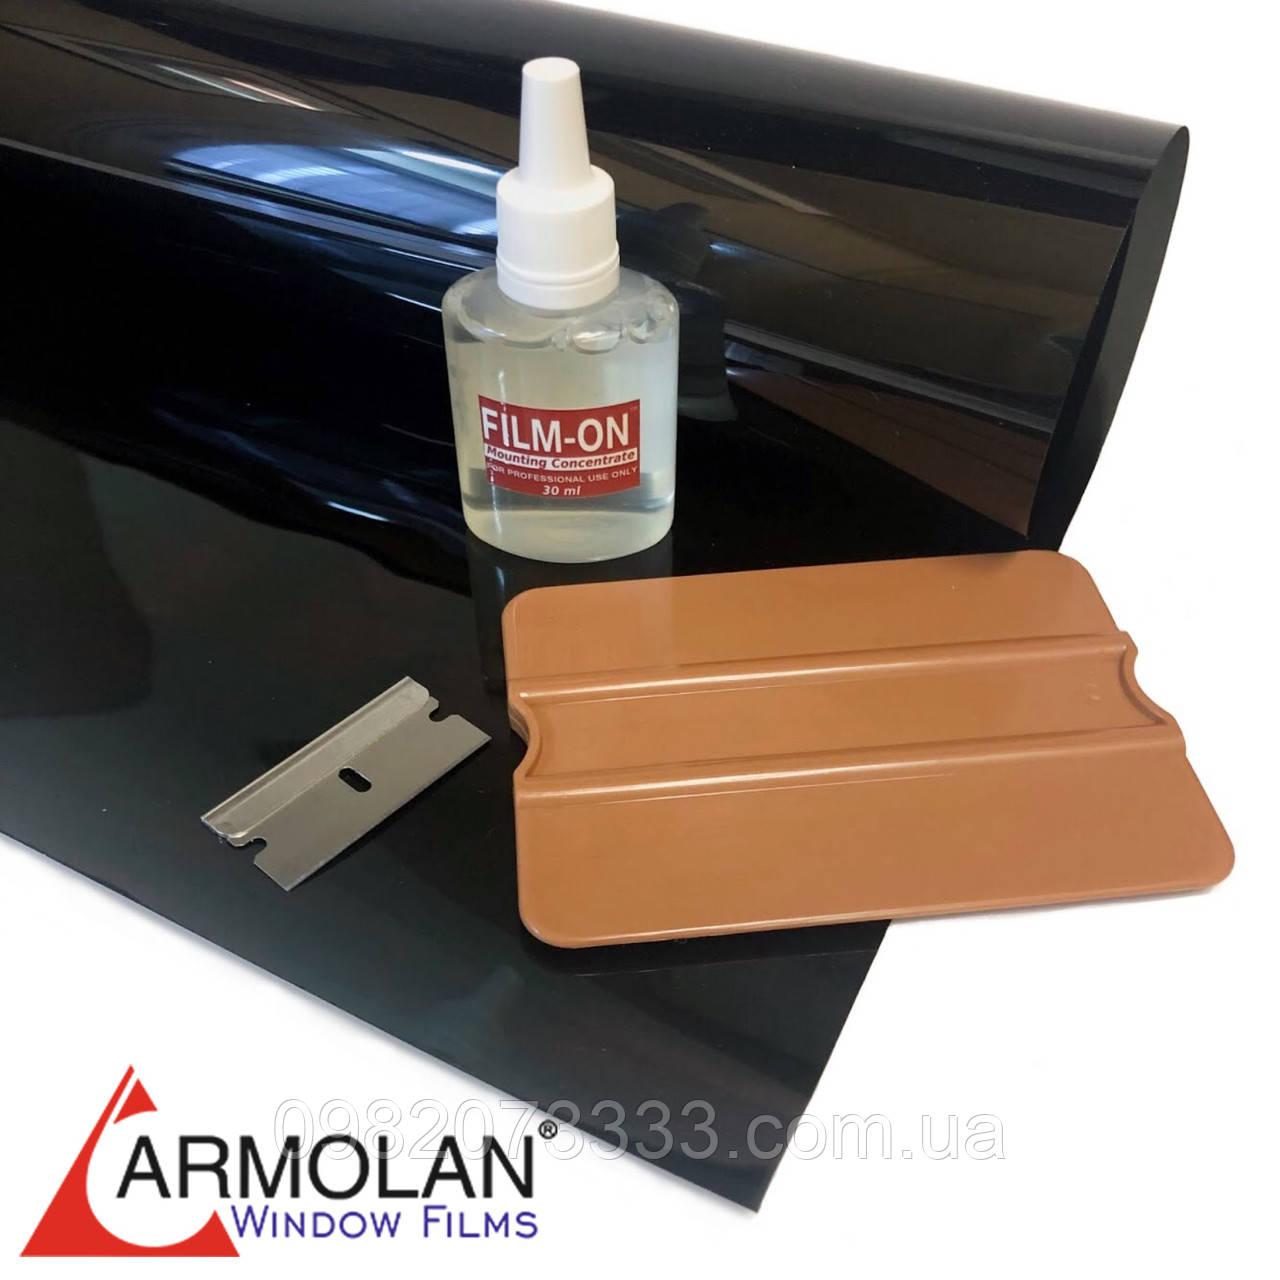 Автомобильная плёнка XAR 20 CH (размер 0,75х3м) + инструмент для тонировки авто Armolan США цена за комплект